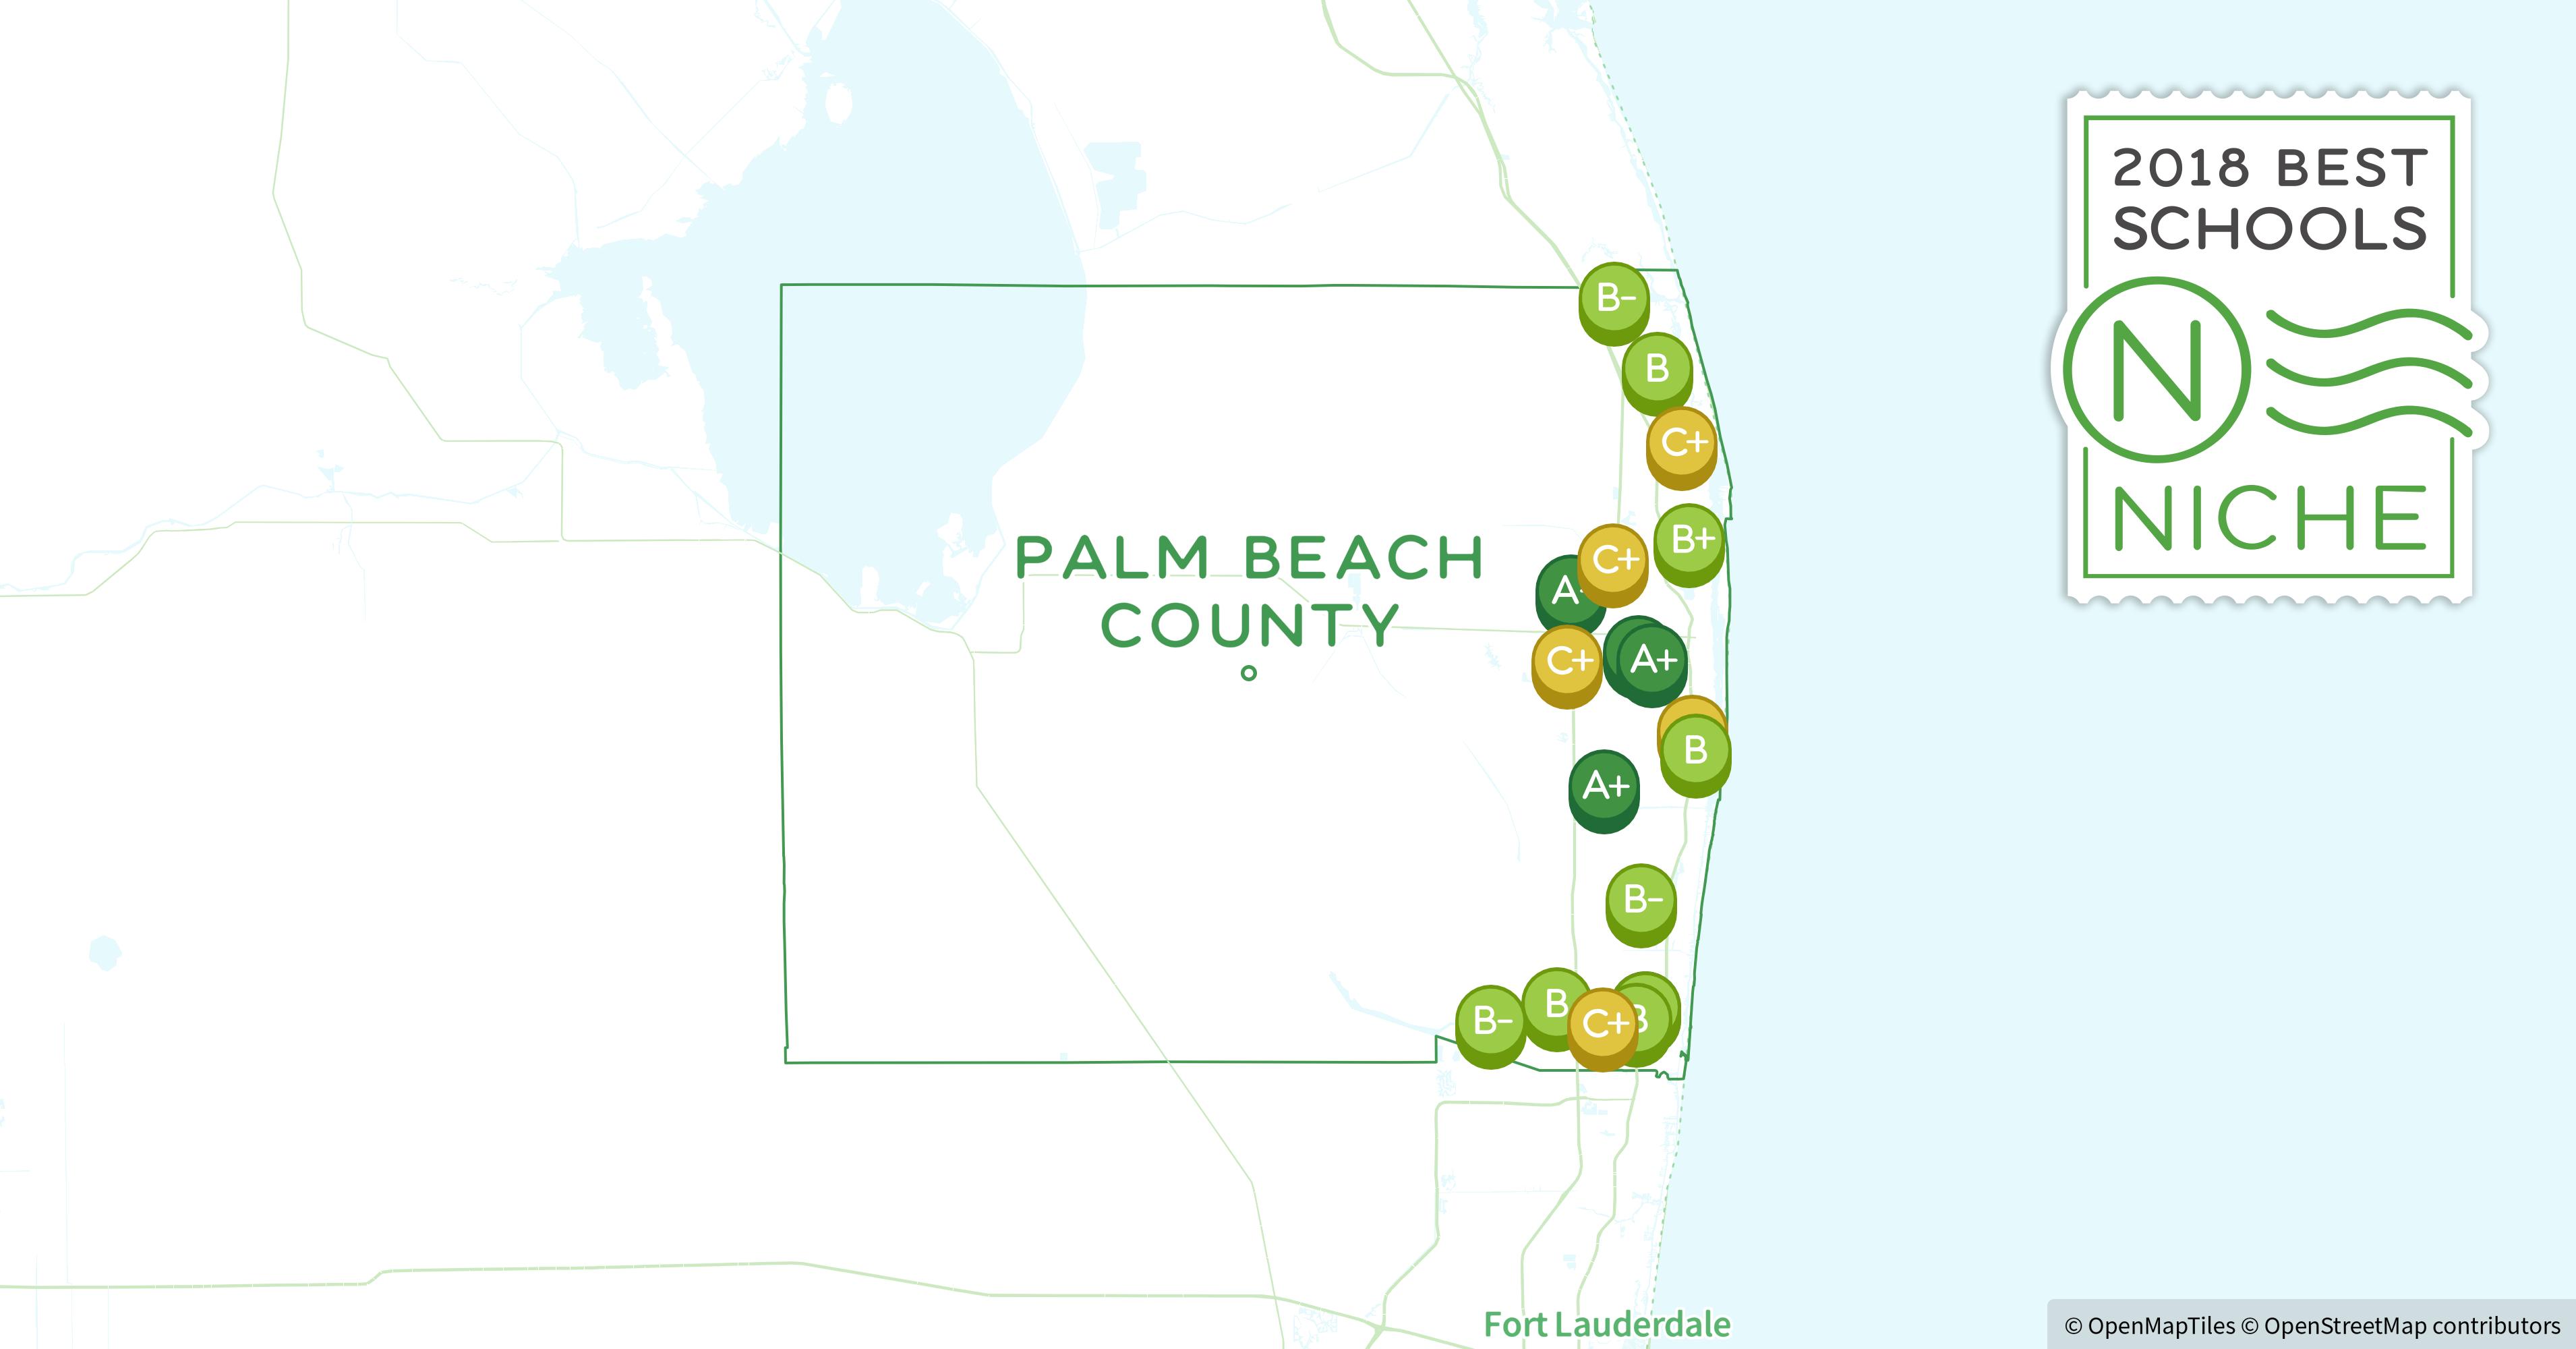 2018 Best High Schools in Palm Beach County, FL - Niche